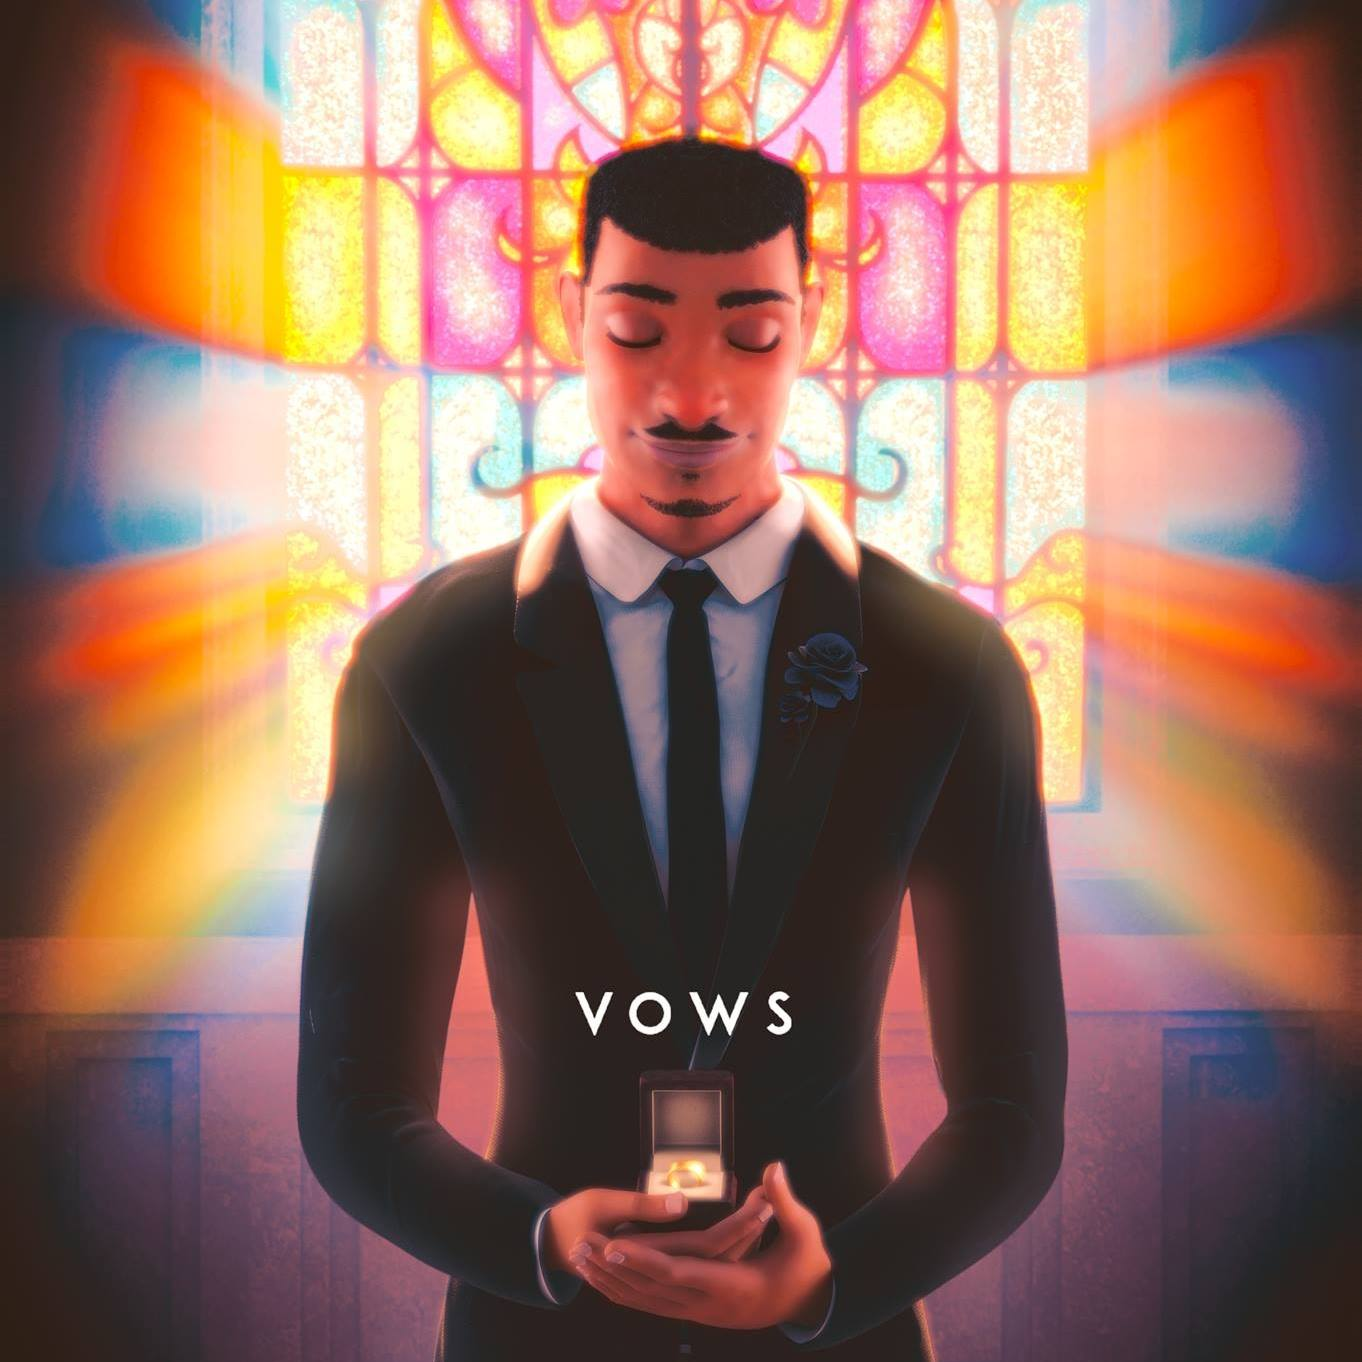 Vows   Animation - 2017 - Sound Effects Editor   SCAD Dean's Award - Achievement in Animation 2017